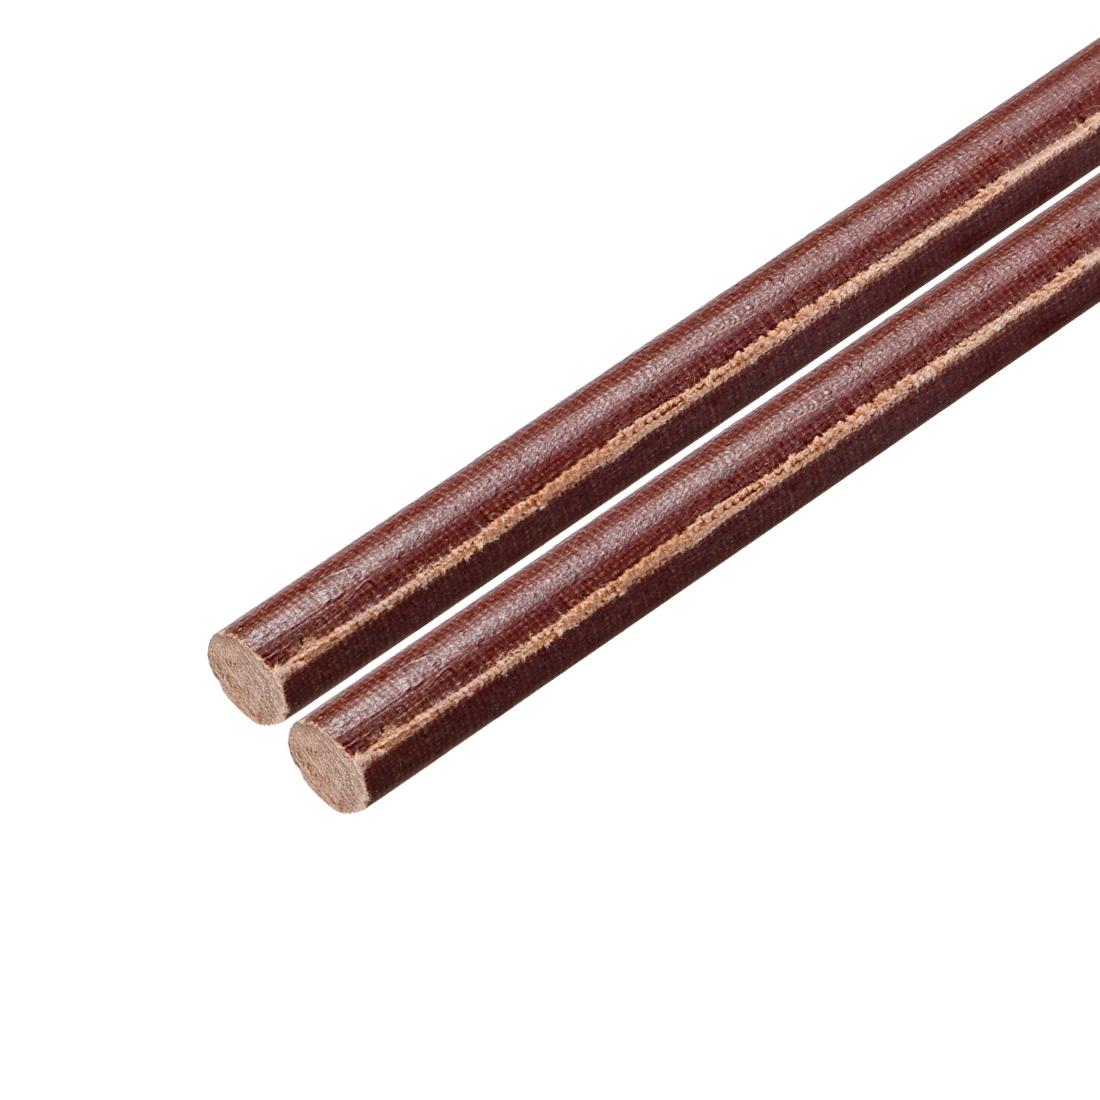 "Phenolic Round Rod, Opaque Natural 8mm Dia 20"" Length 2pcs"